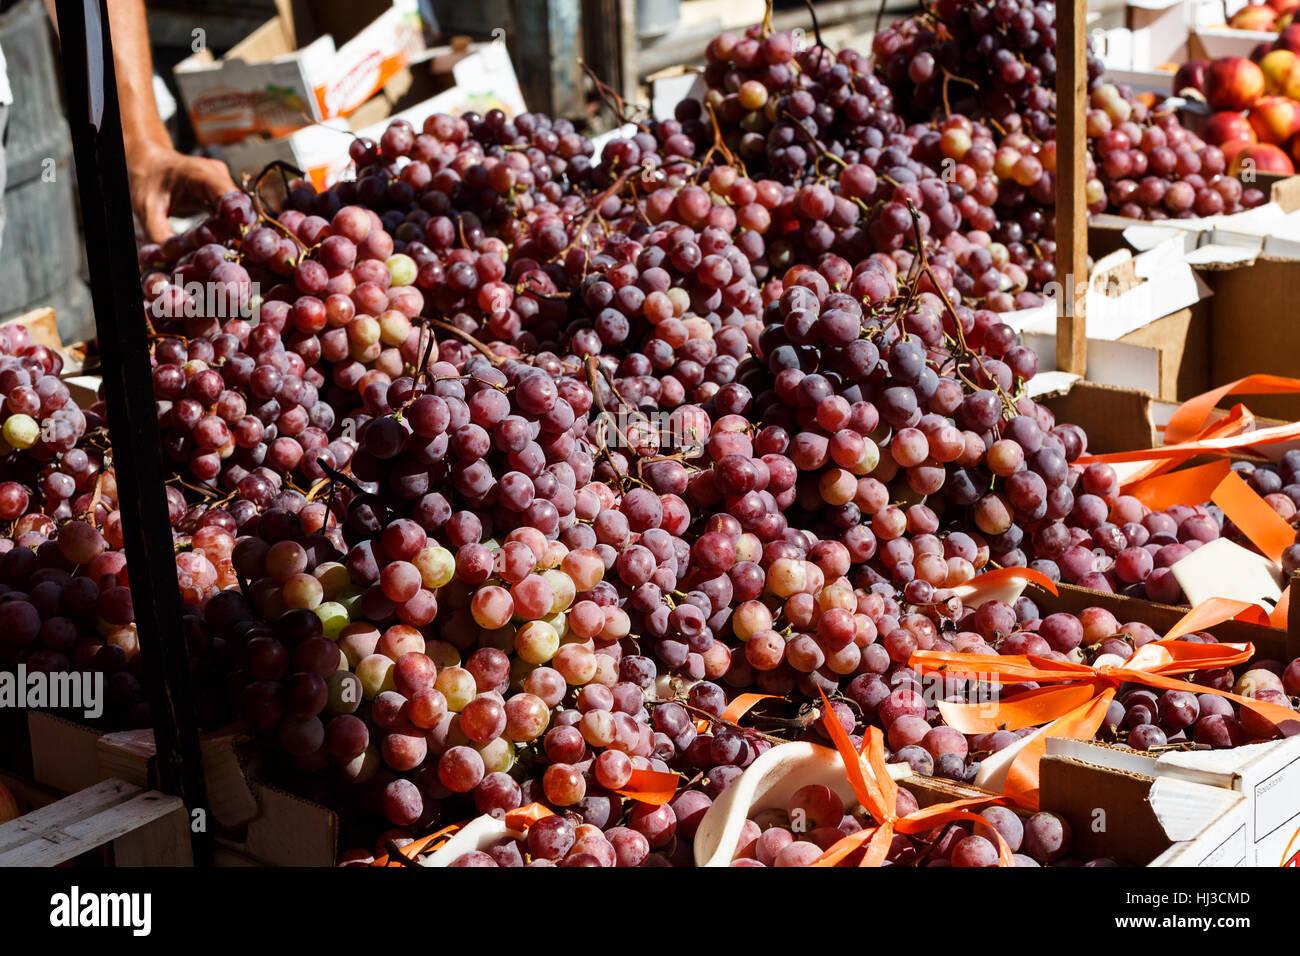 Harvested fresh red grapes, Ballaro market, Palermo, Sicily, Italy - Stock Image